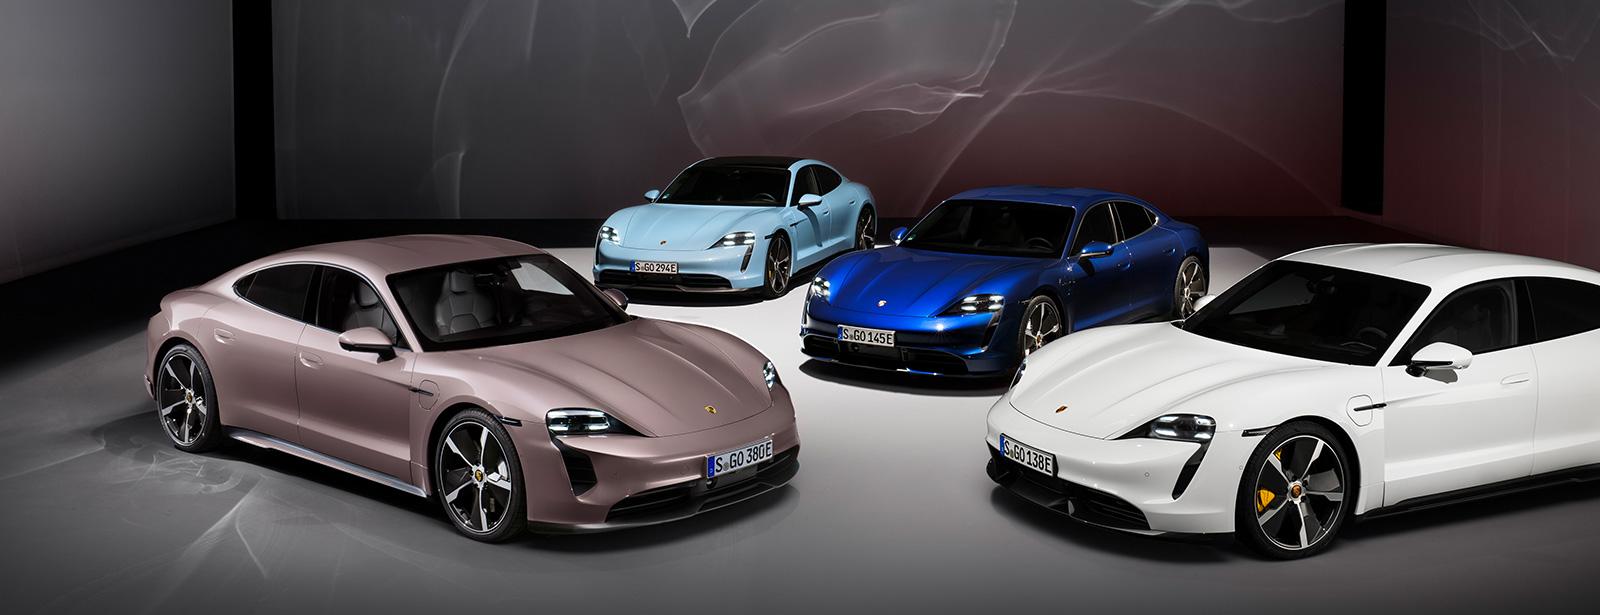 Porsche Taycan AAS  (1)